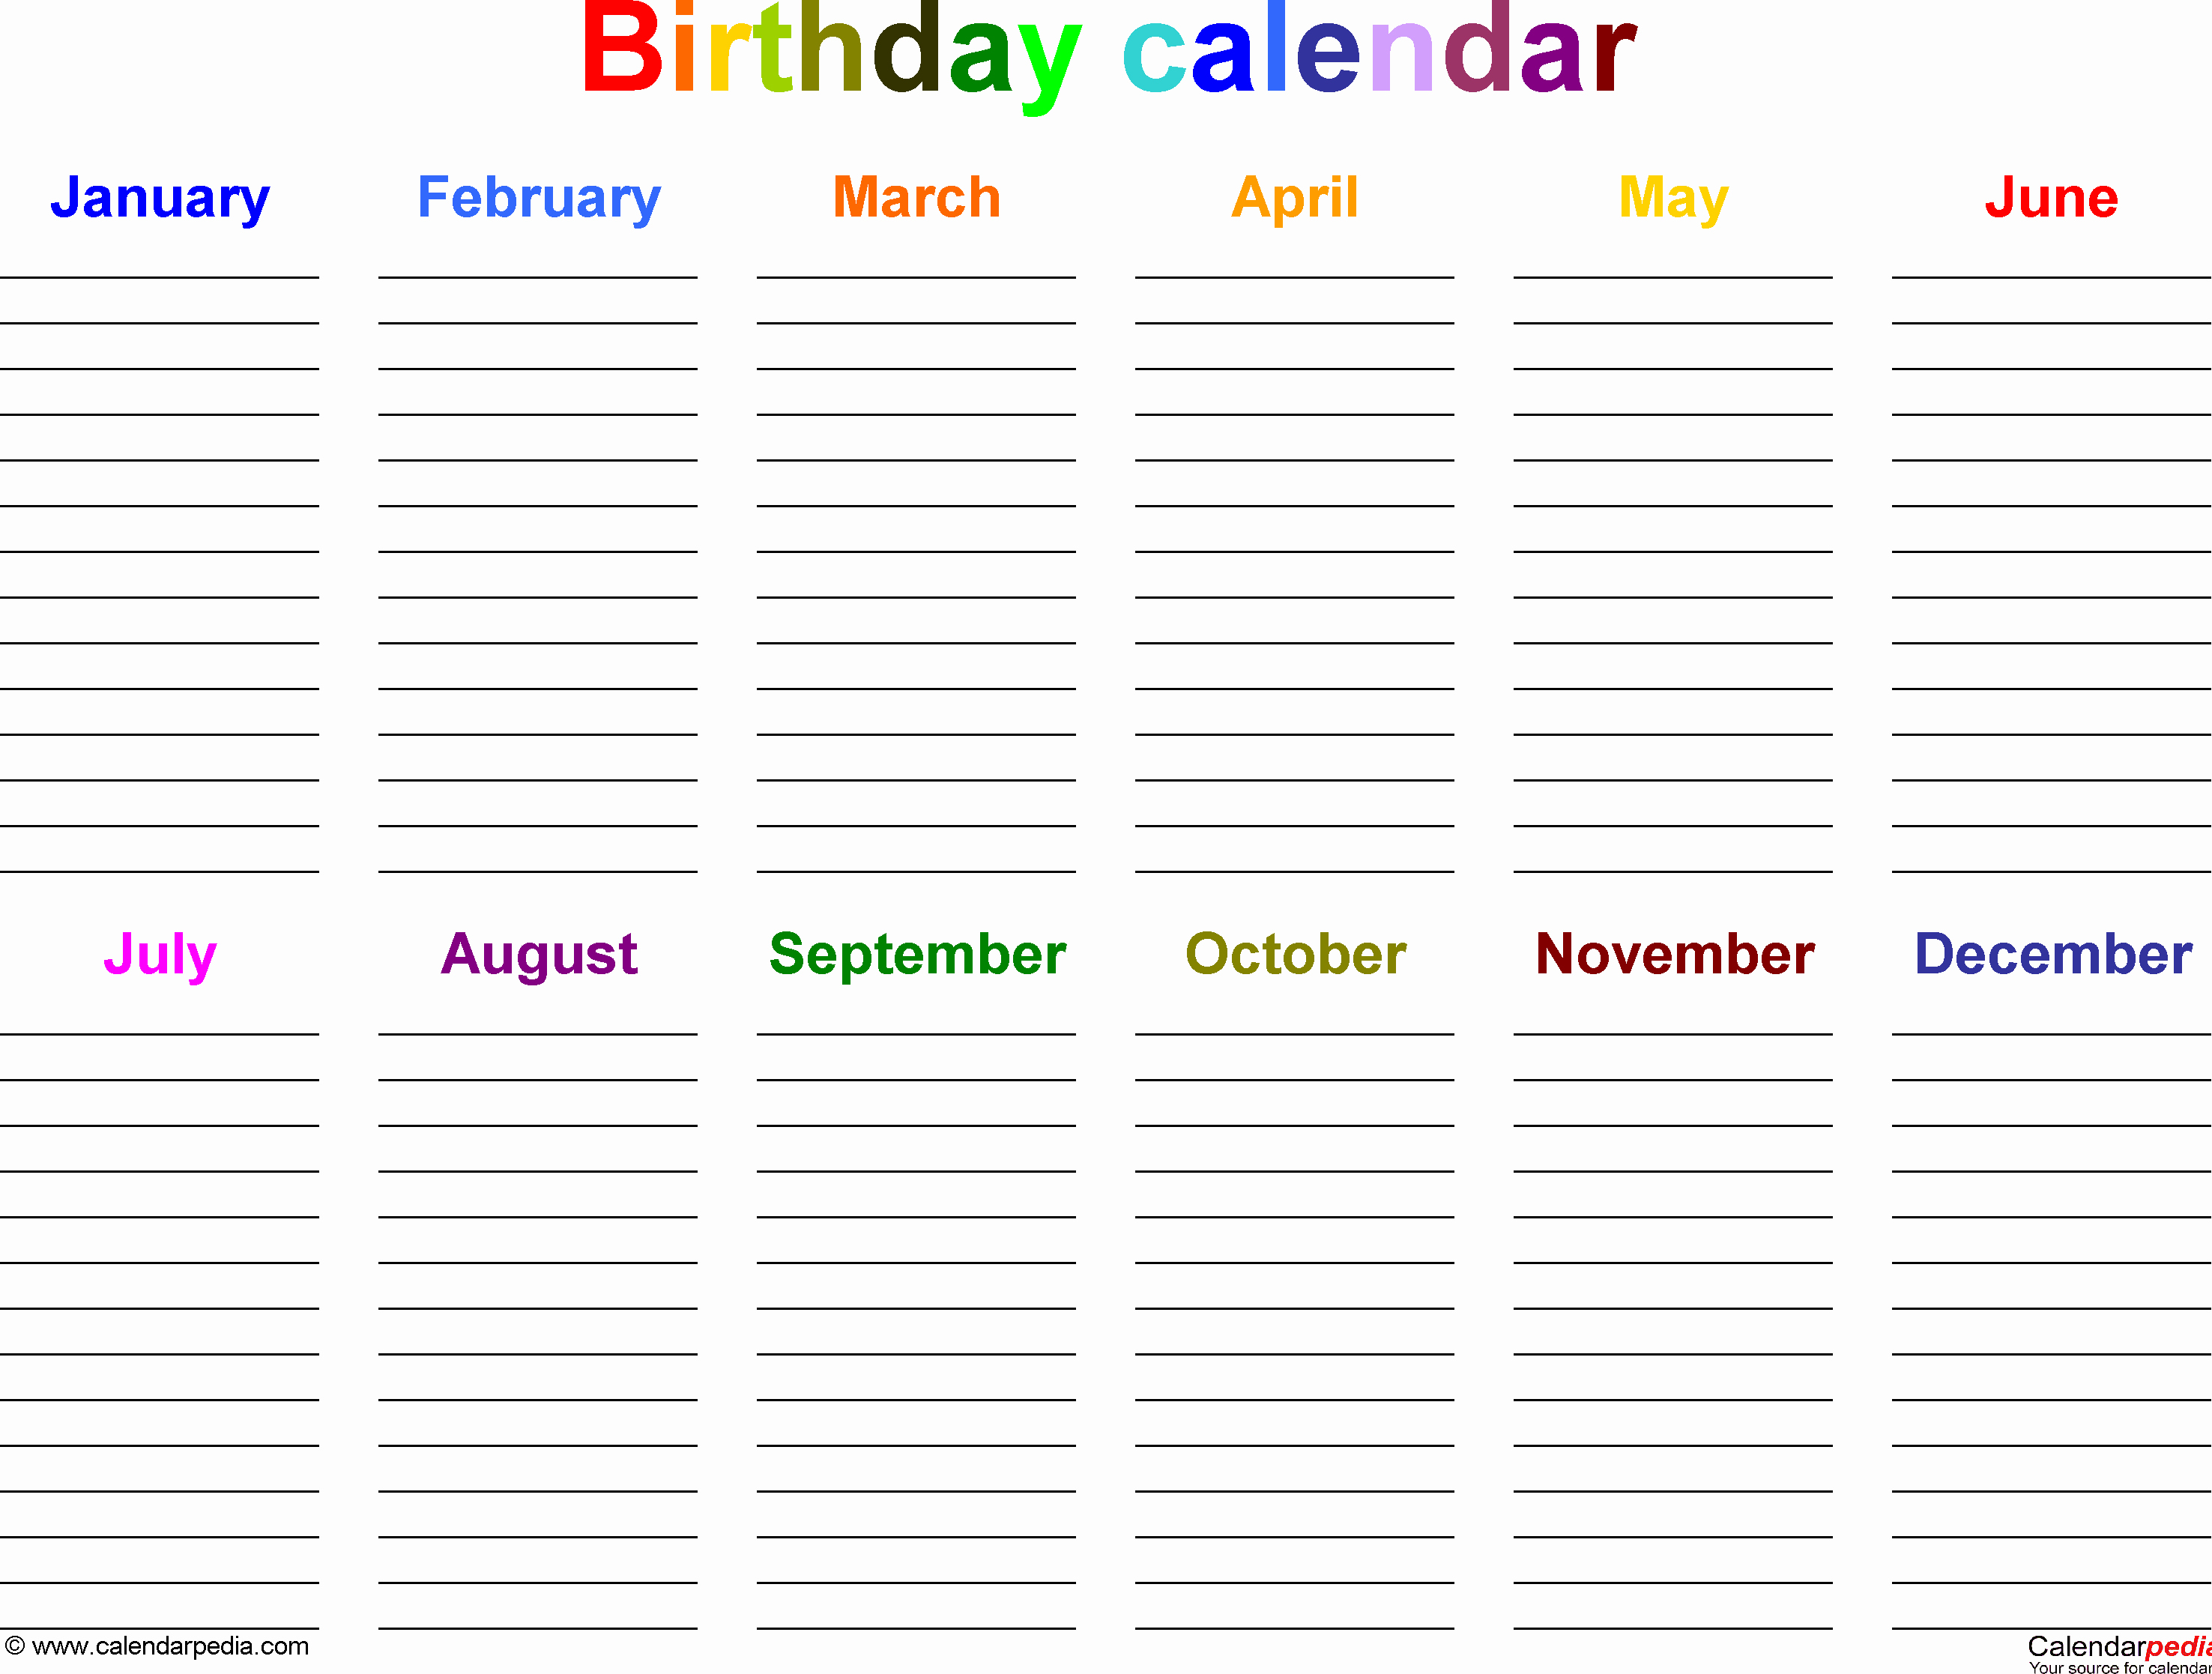 Printable Birthday Calendar Template Elegant Birthday Calendars Free Printable Microsoft Word Templates